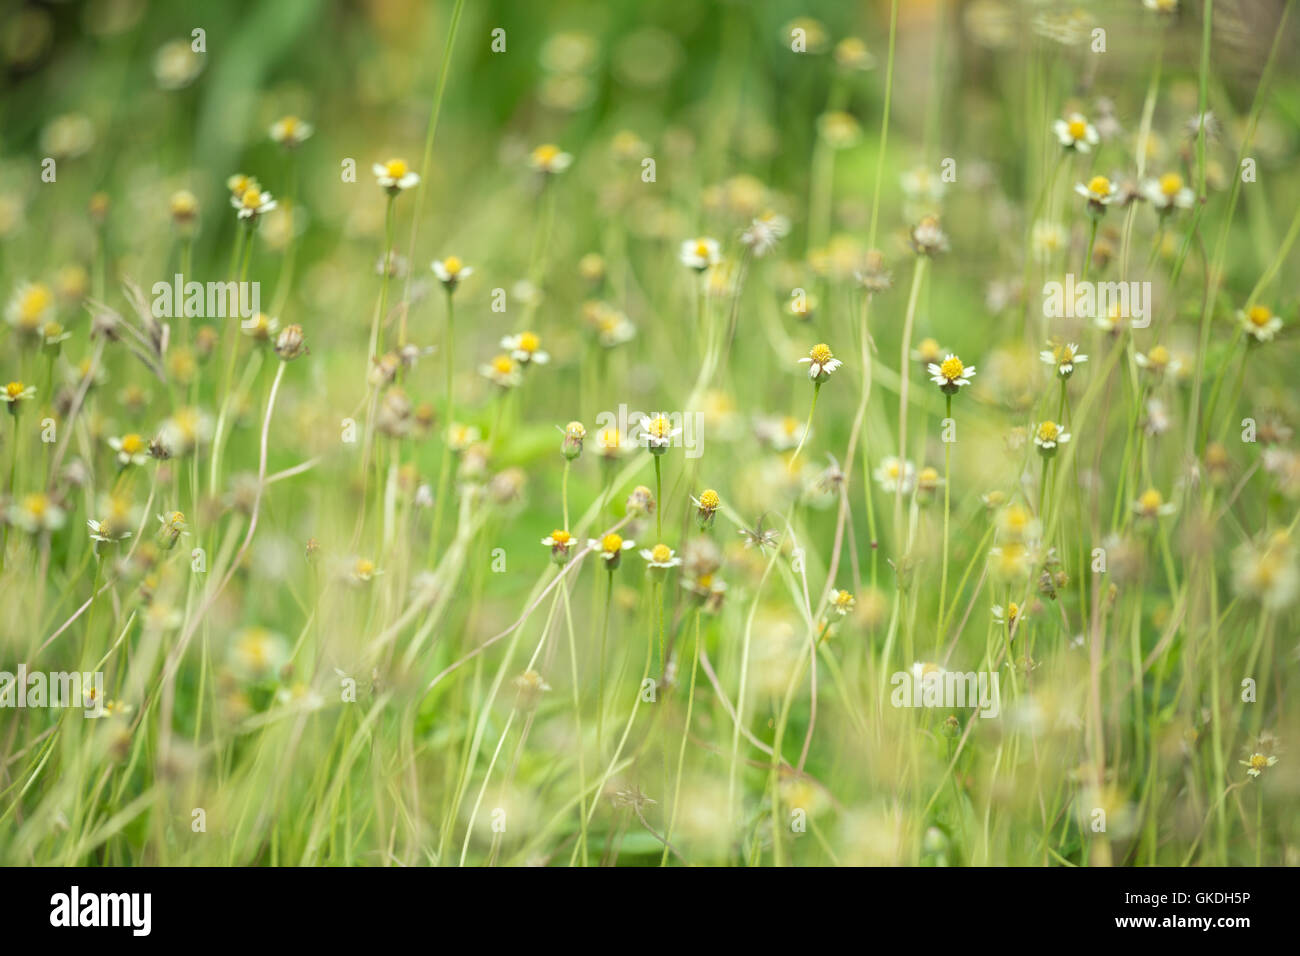 Little white flower yellow pollen stock photos little white flower little white flower with yellow pollen little iron weed grass flower stock mightylinksfo